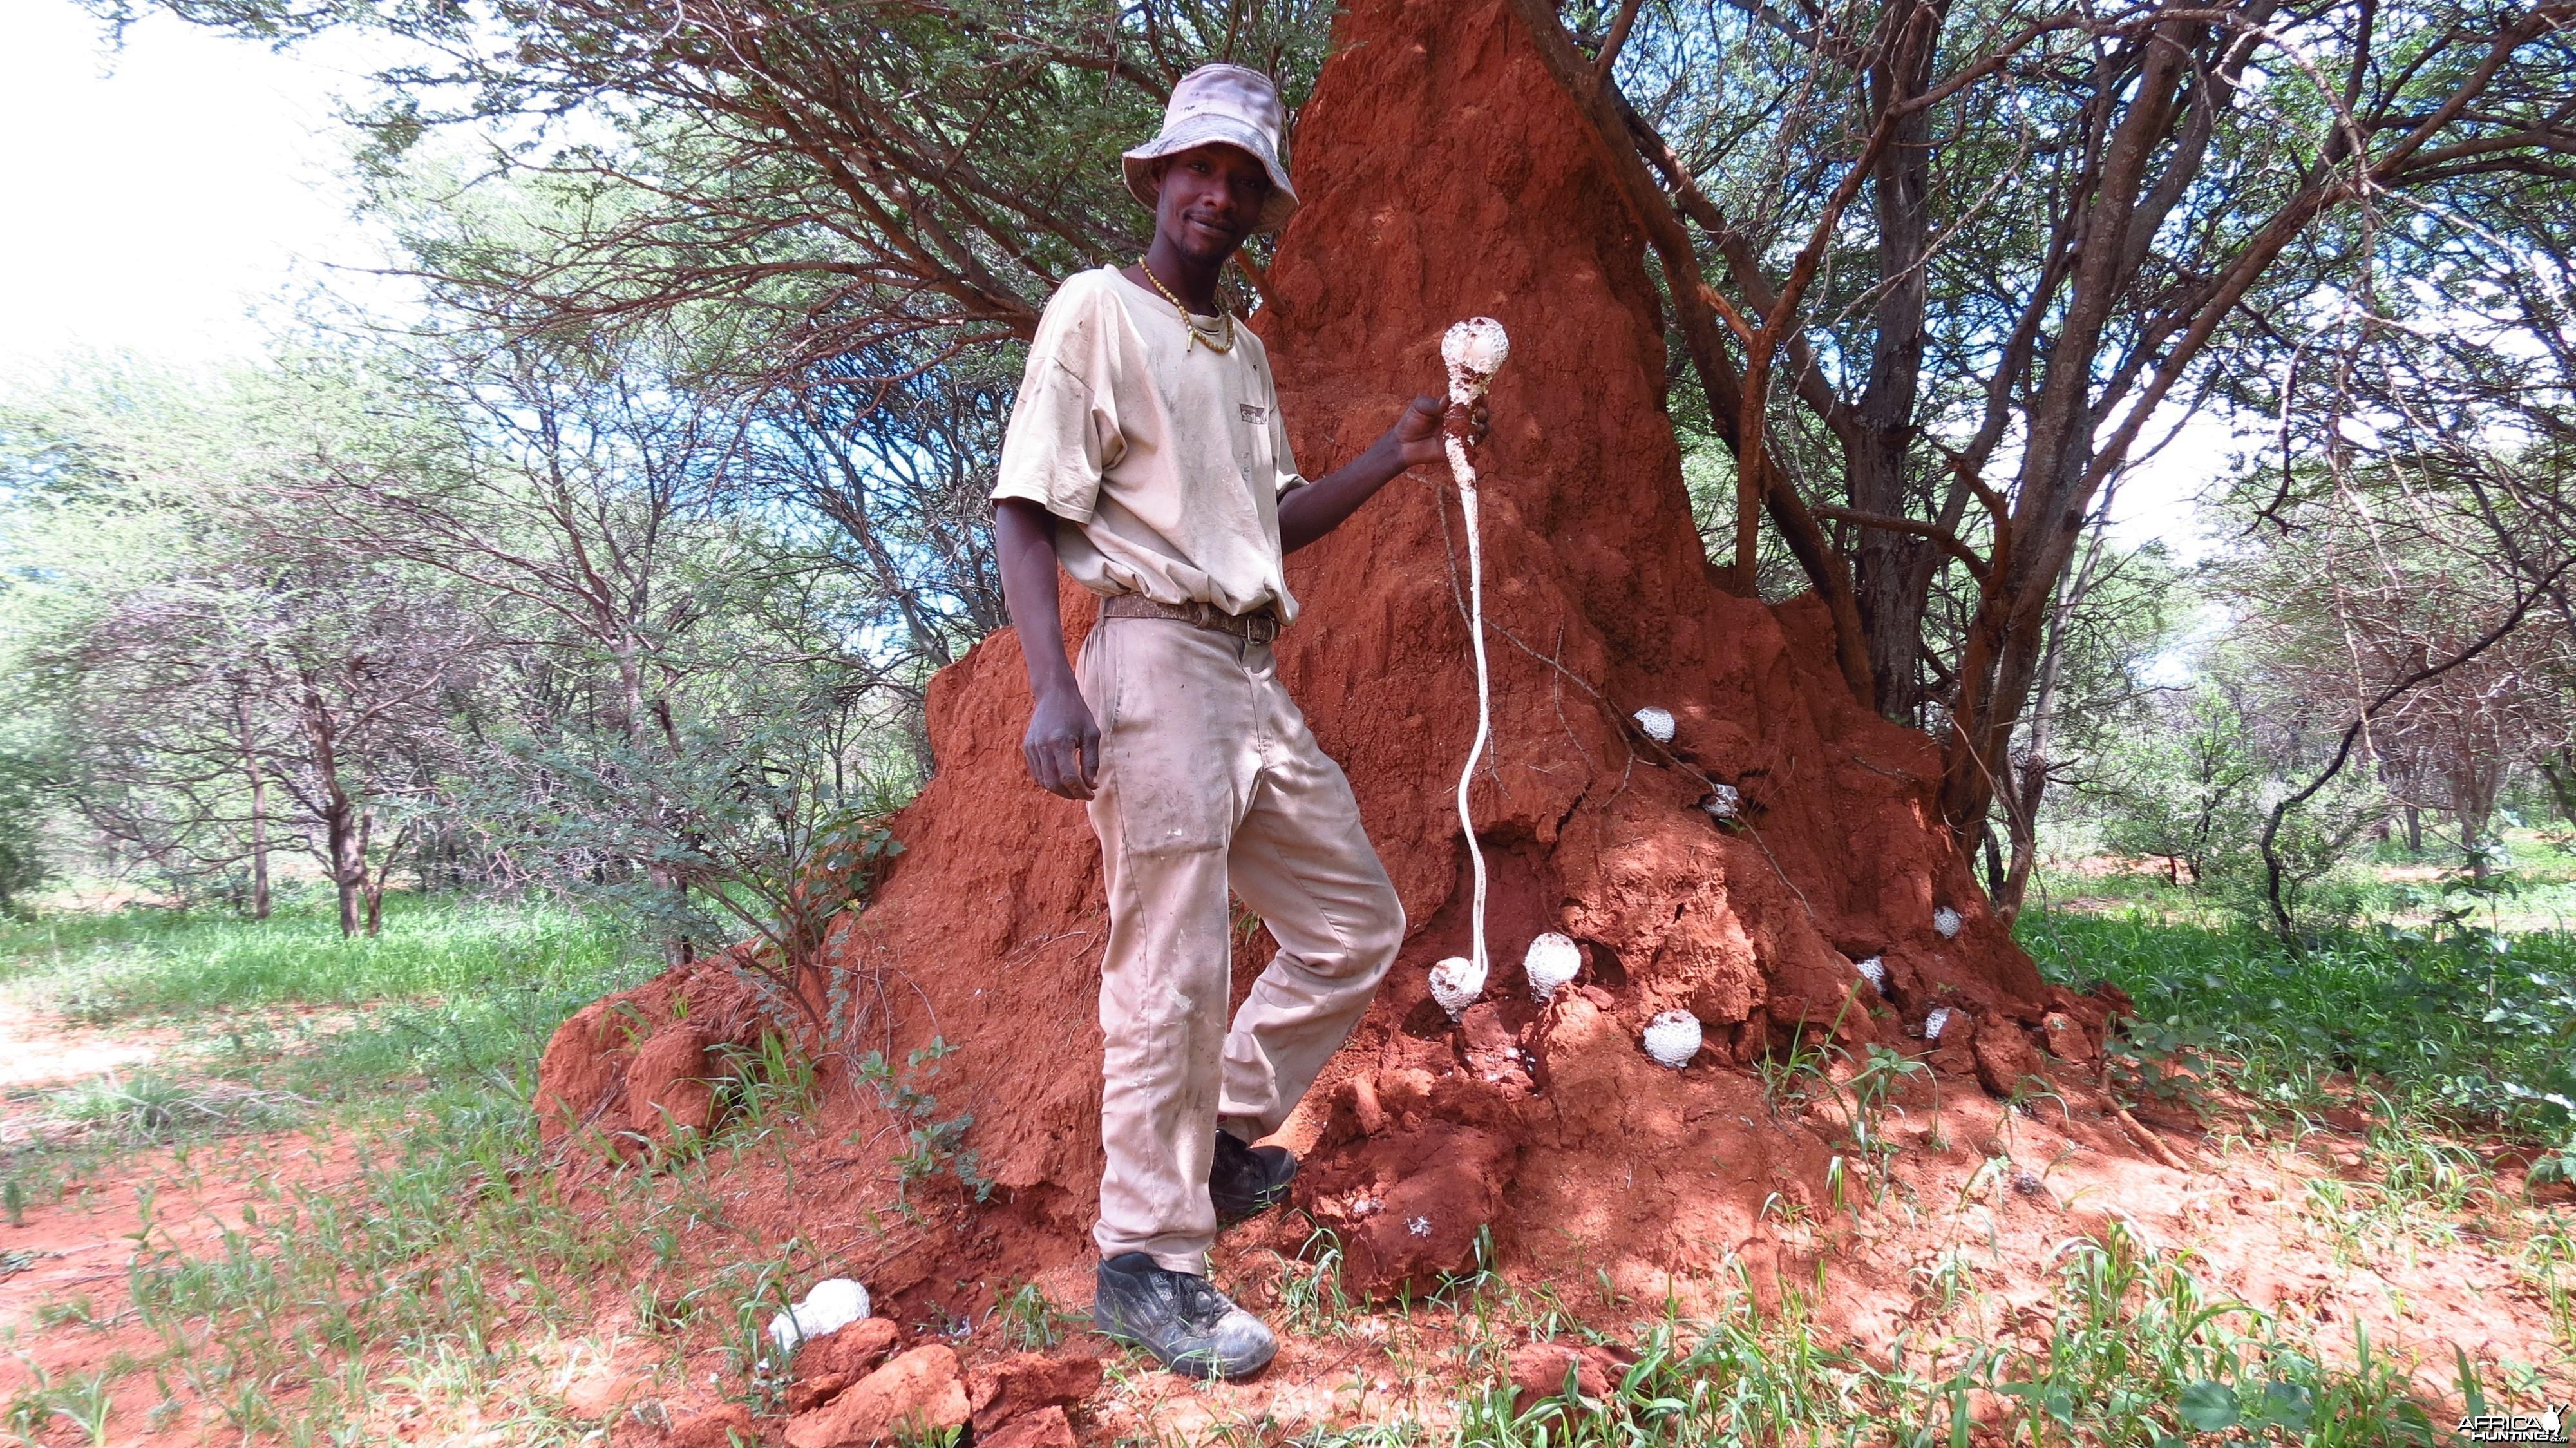 Omajowa termite hill mushrooms Namibia